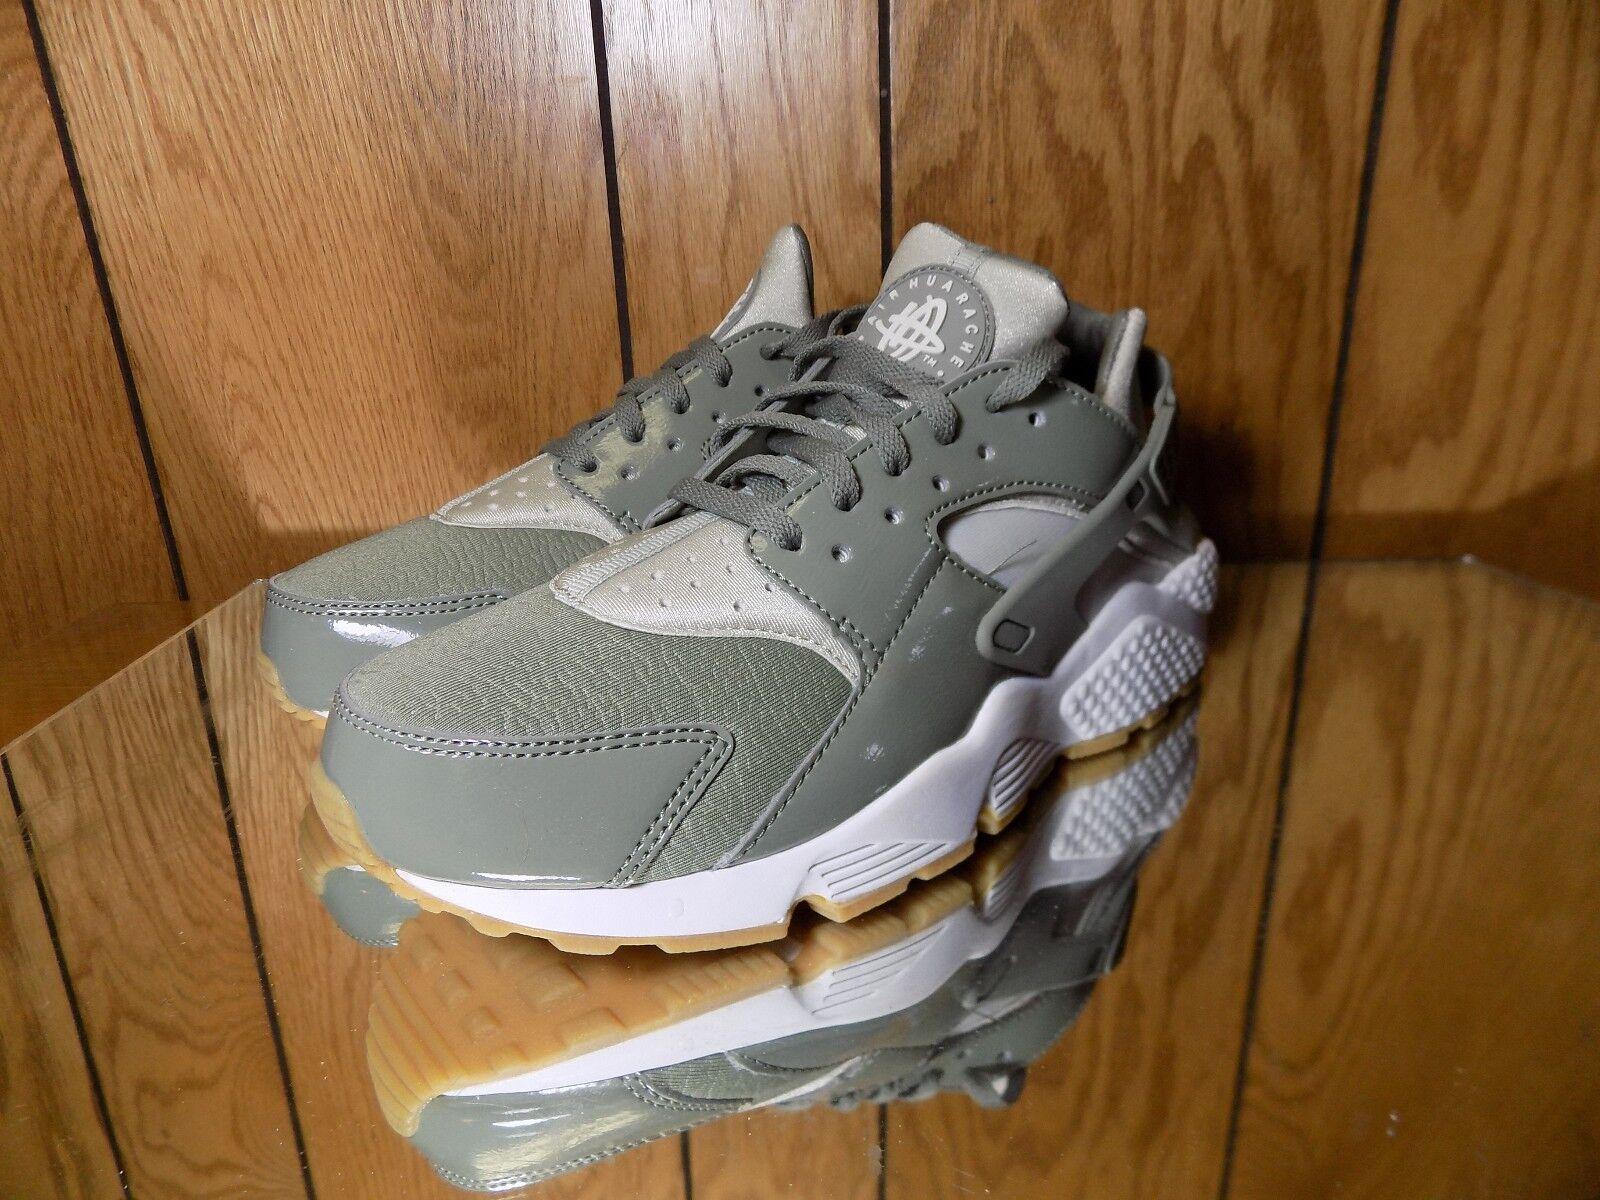 6202d36e6e1ad ... Nike Nike Nike Women s AIR HUARACHE RUN shoes Dark Stucco Pale Grey  634835-027 ...